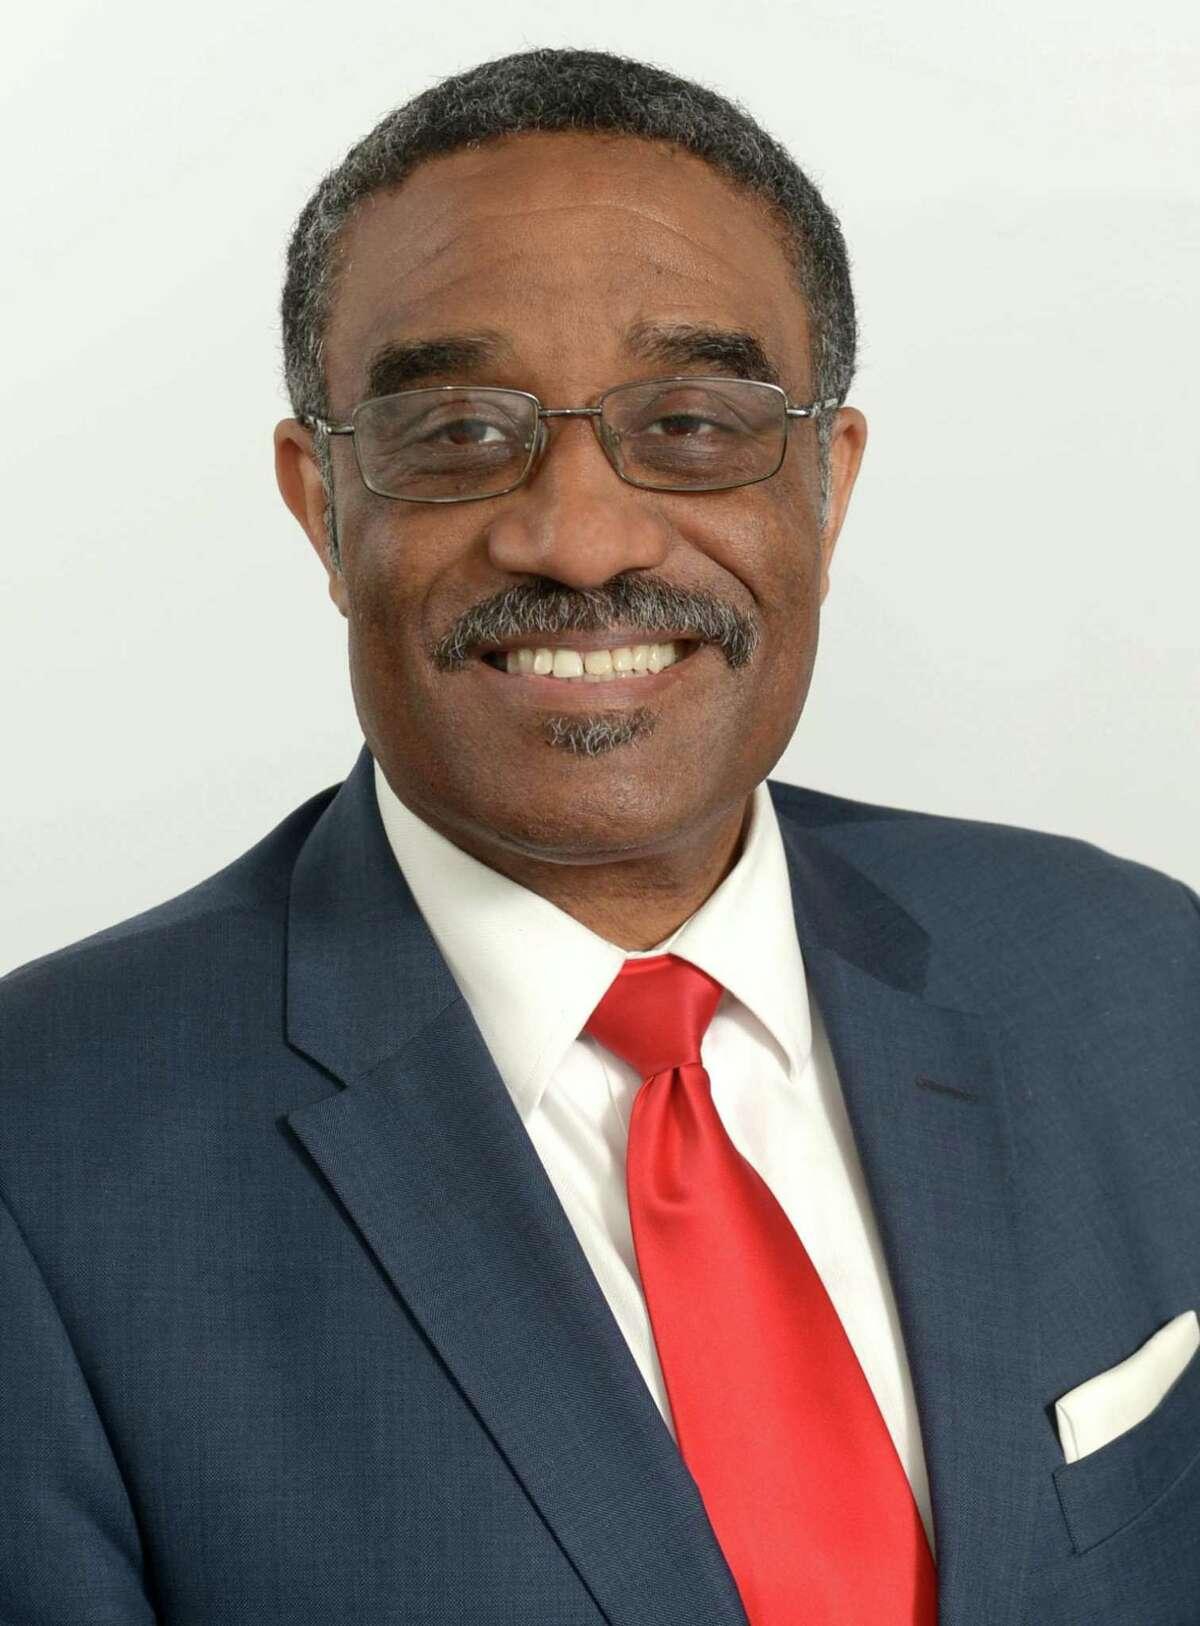 Bruce Morris, Democrat petition candidate for mayor